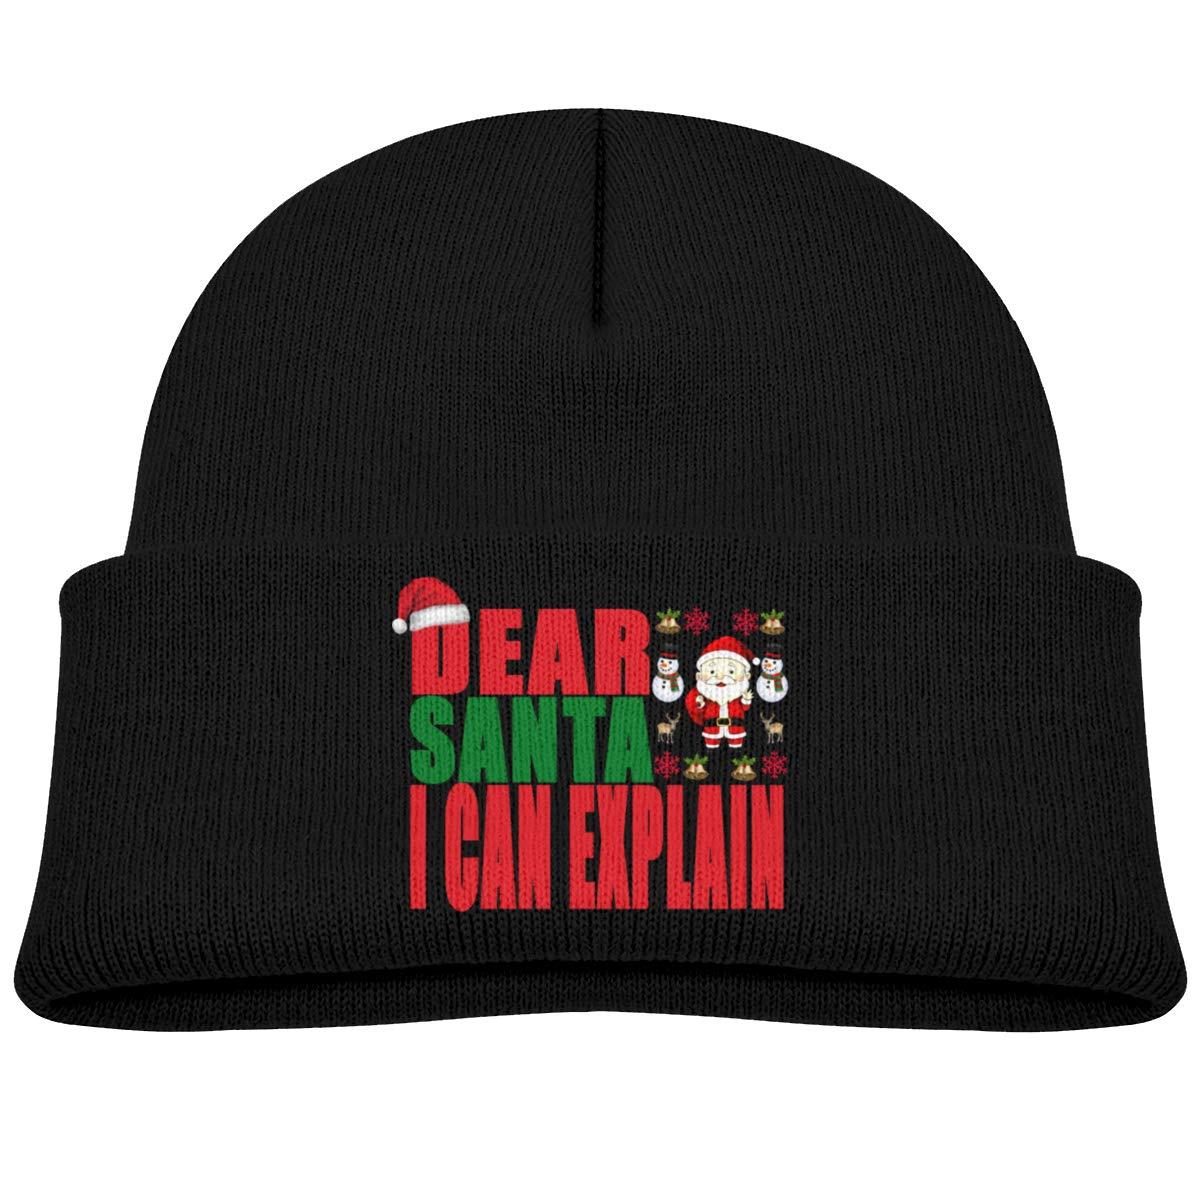 Moniery Dear Santa I Can Explain Knit Cap Baby Boy